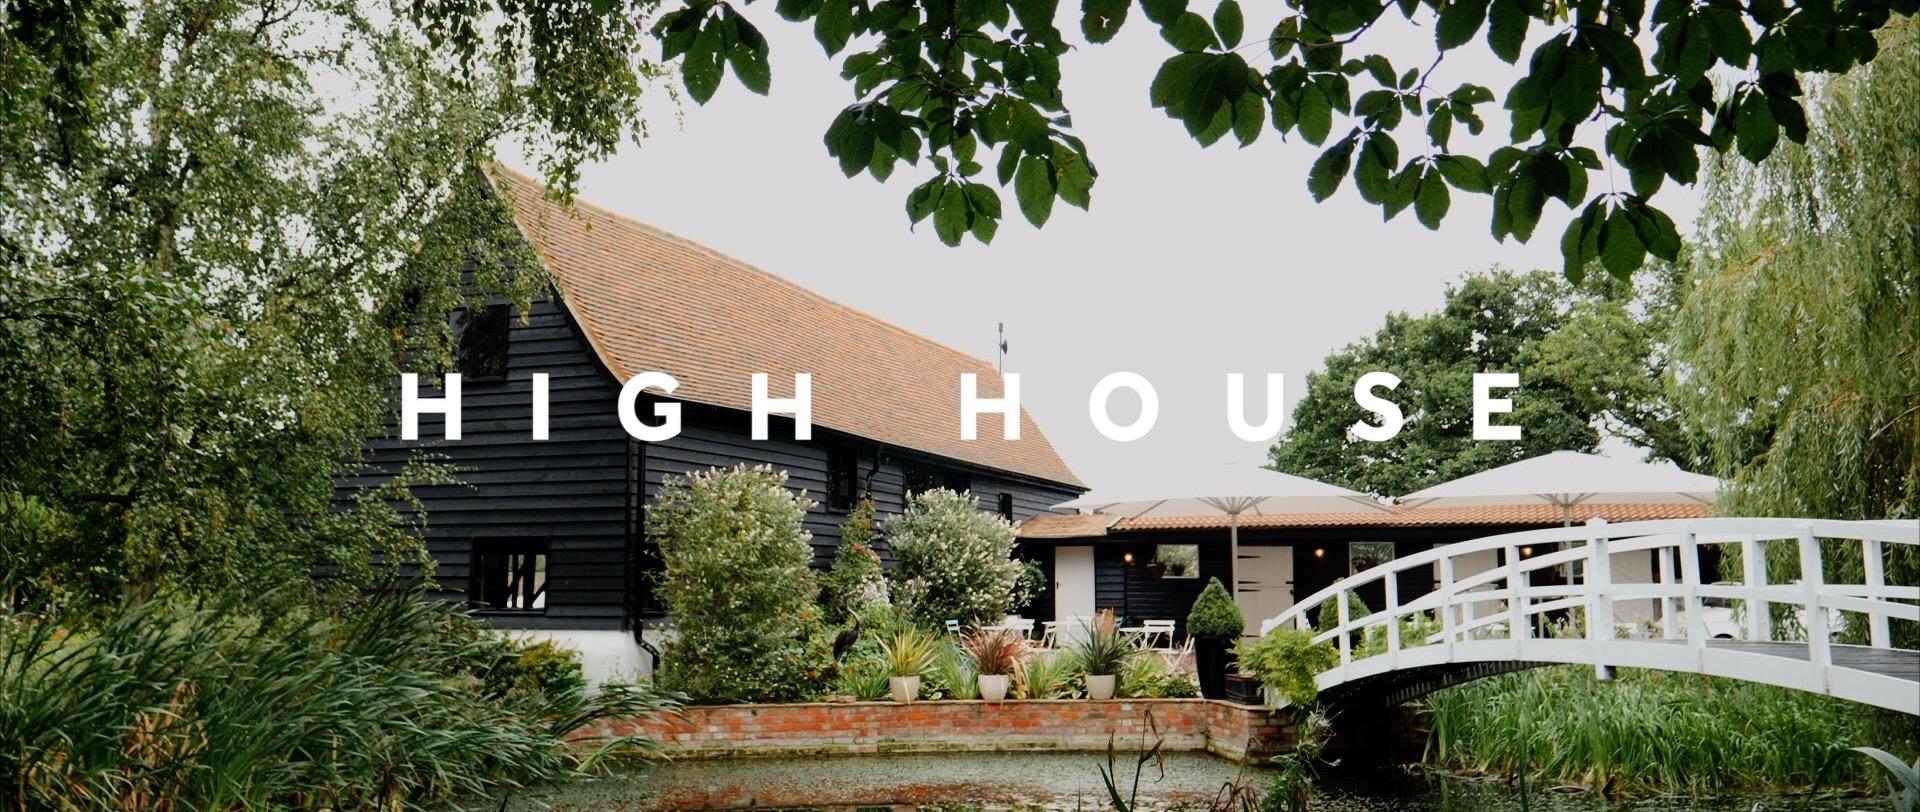 High House Althorne Videography